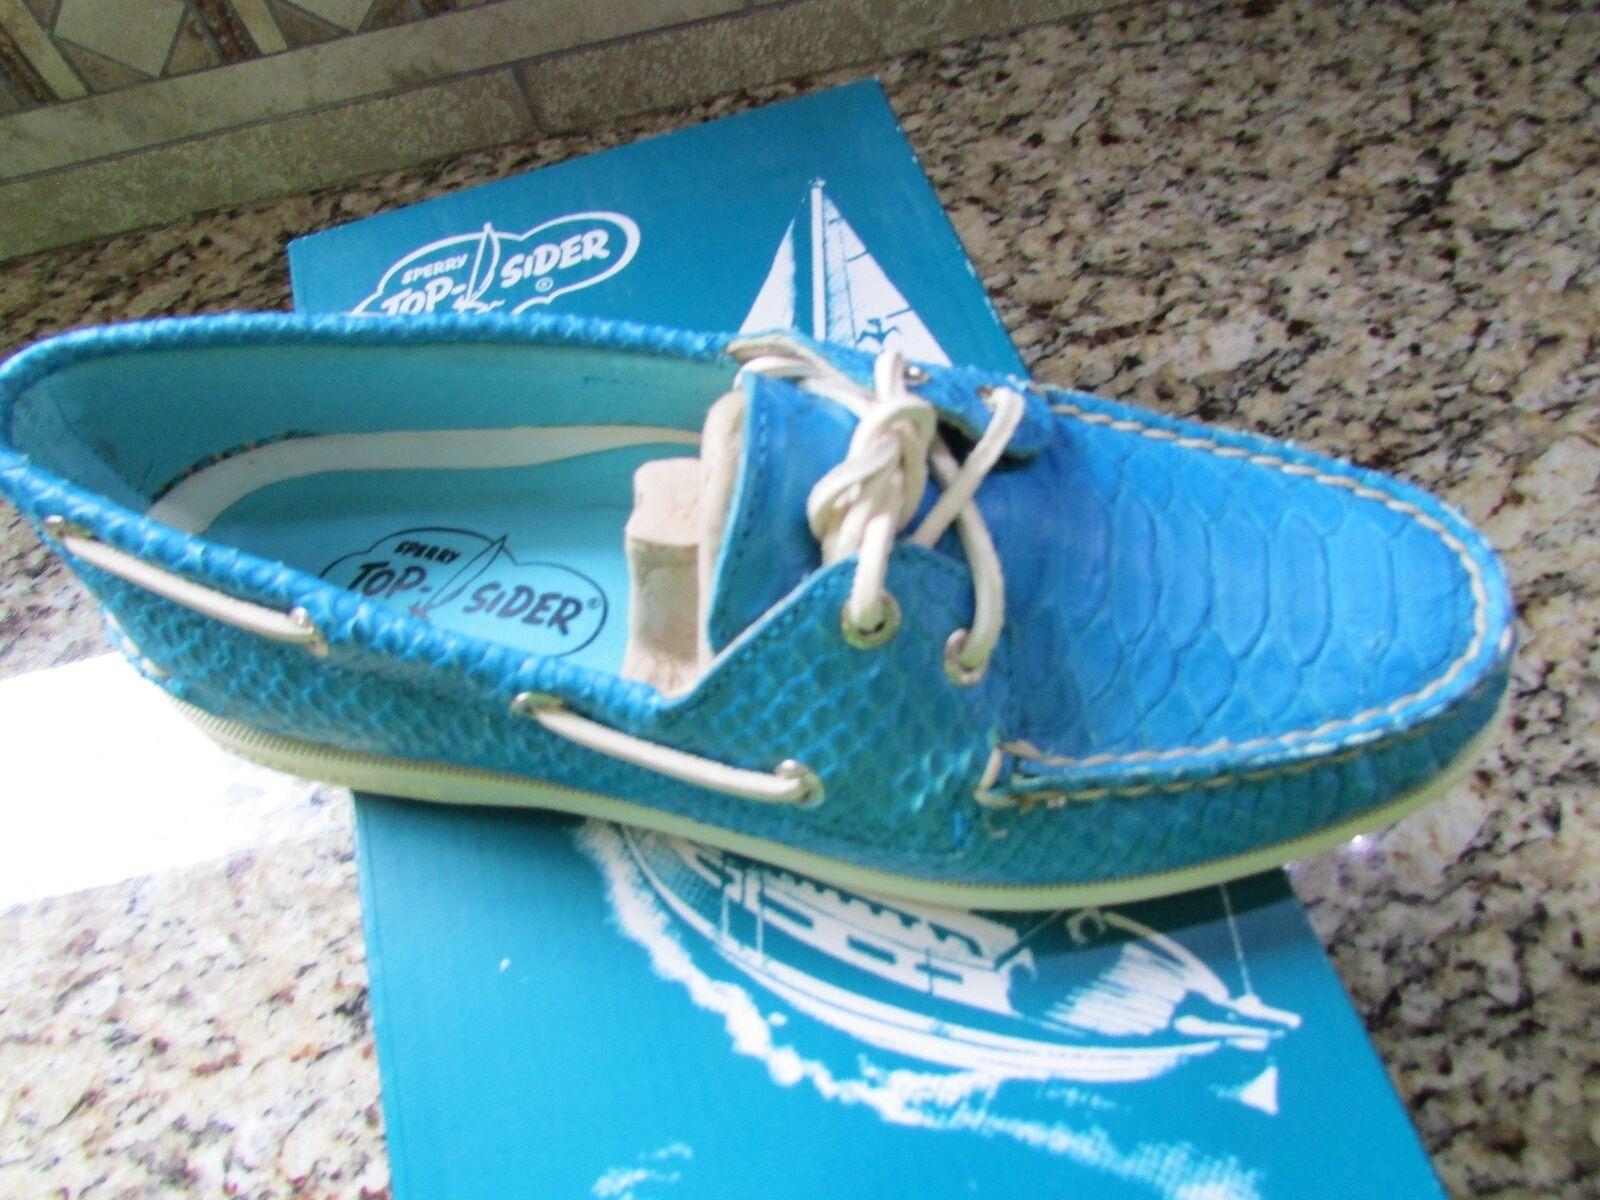 NEW SPERRY TOP-SIDER A/O BLUE PYTHON BOAT Scarpe Donna 8 SNAKE FREE SHIP  150